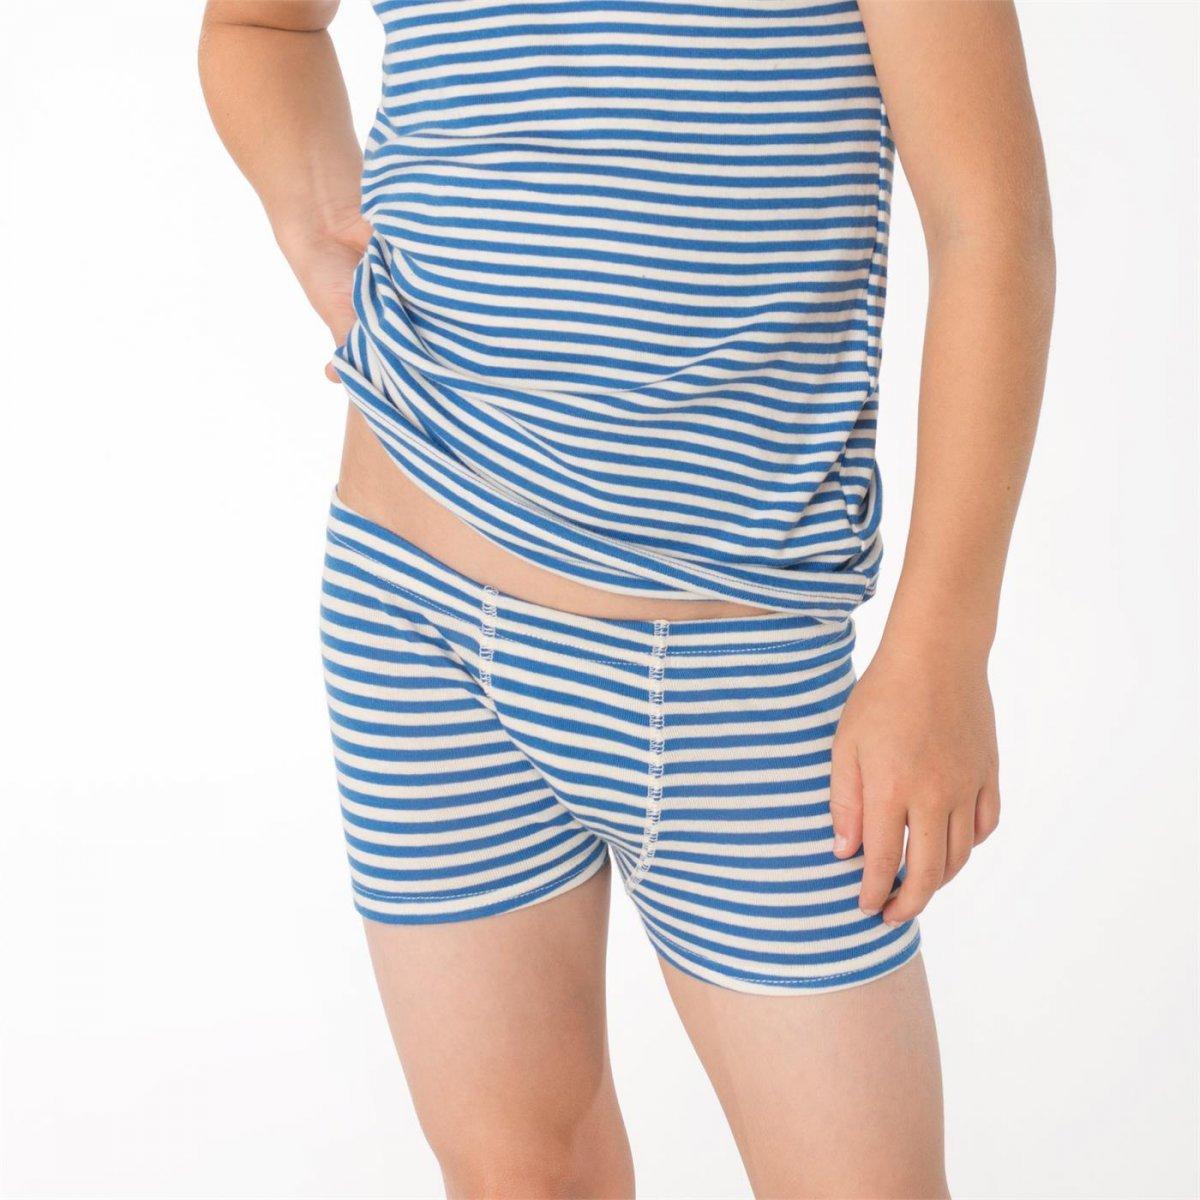 Boys shorts striped in organic cotton